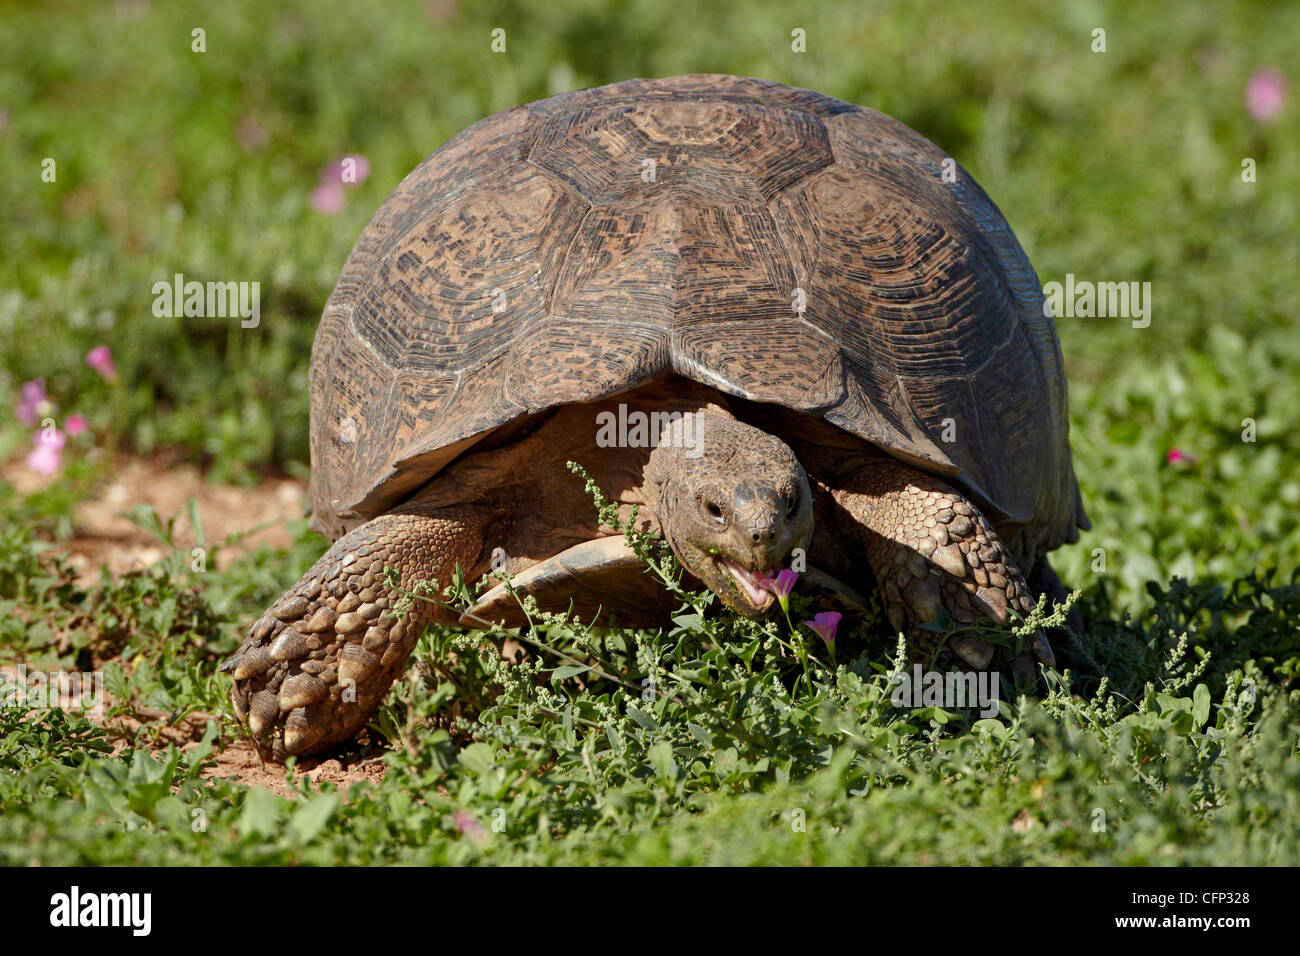 Leopard tortoise (Geochelone pardalis), Addo Elephant National Park, South Africa, Africa - Stock Image